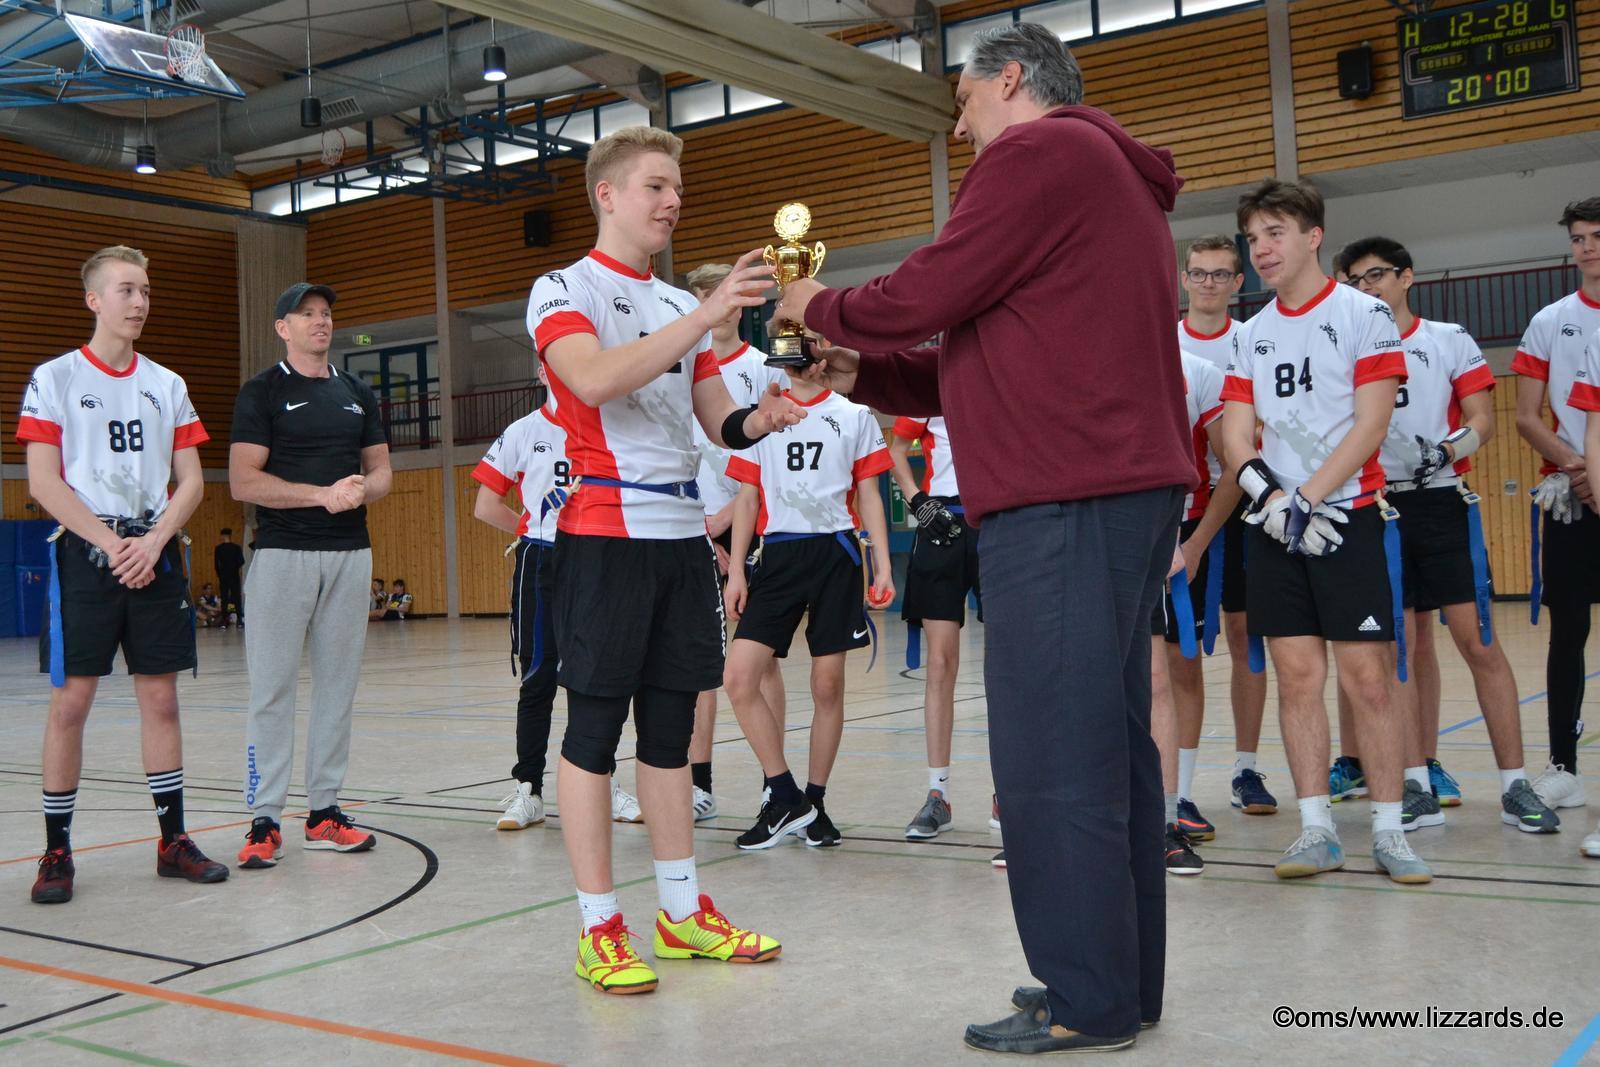 Lizzards Flag Football U16 Jugend / lizzards vs hornets 2019-03-24